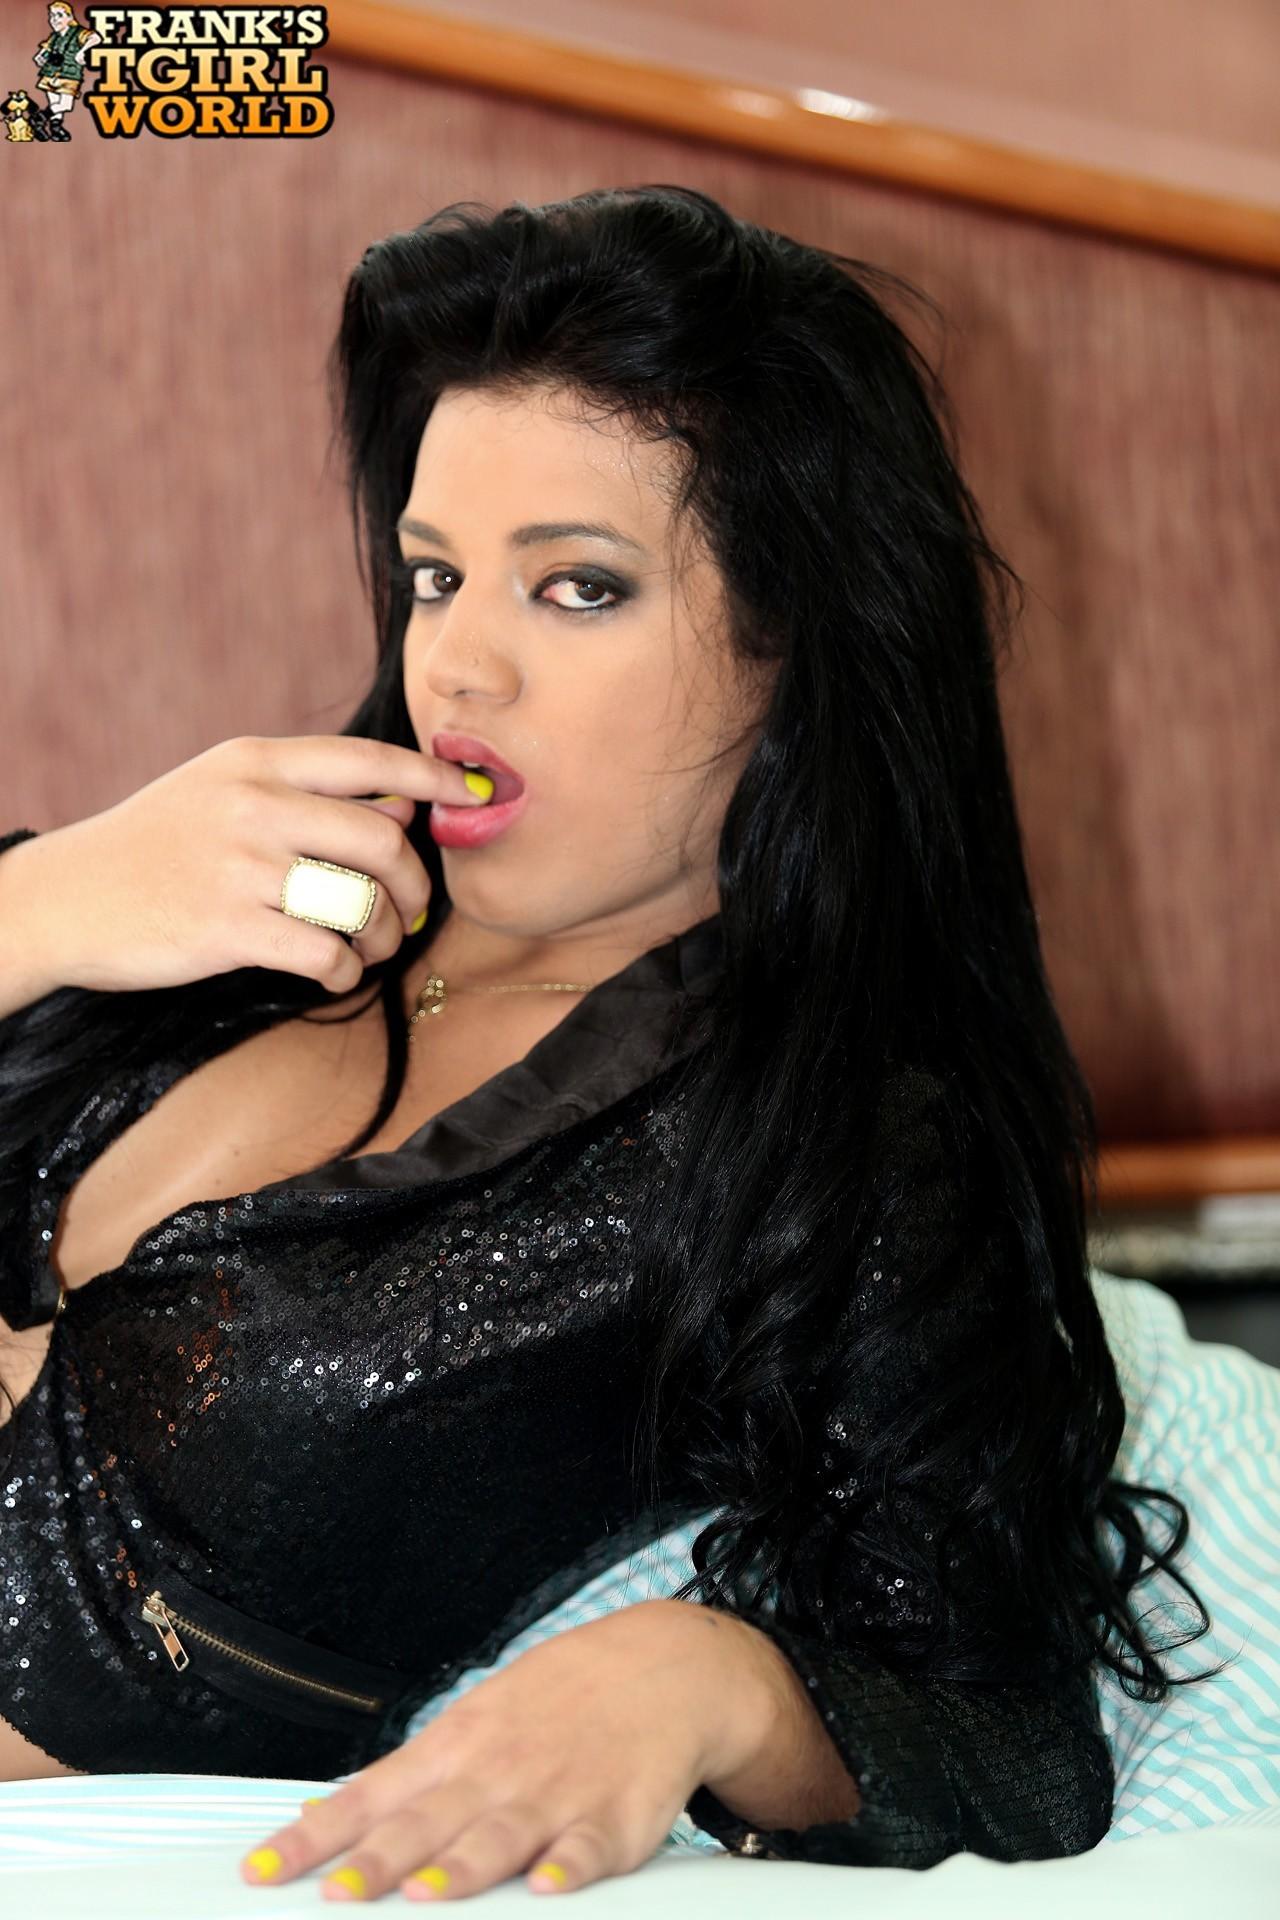 Shyza De Goes Exposing Her Arousing Ladyboy Body